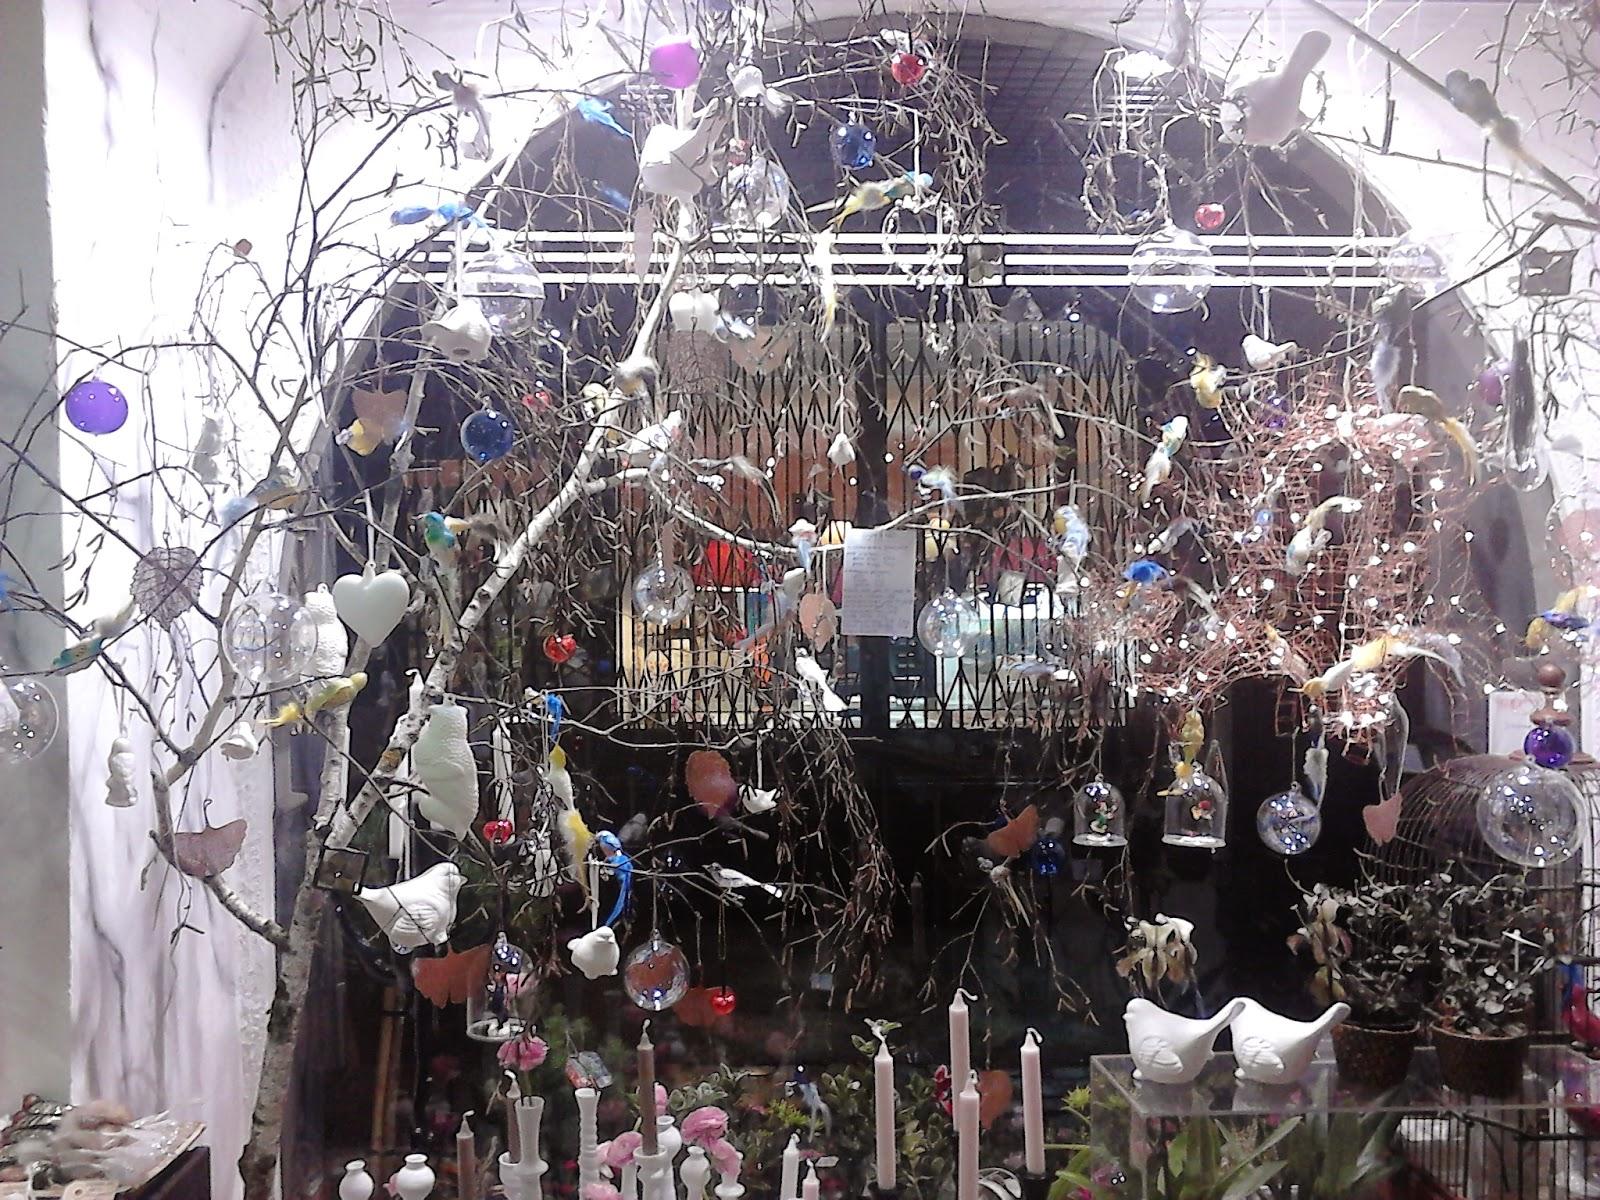 #595378 HOME JASMIN: VITRINES DE NOËL 2014 DECORATION EN MAGASIN 6135 decoration de noel vitrine magasin 1600x1200 px @ aertt.com